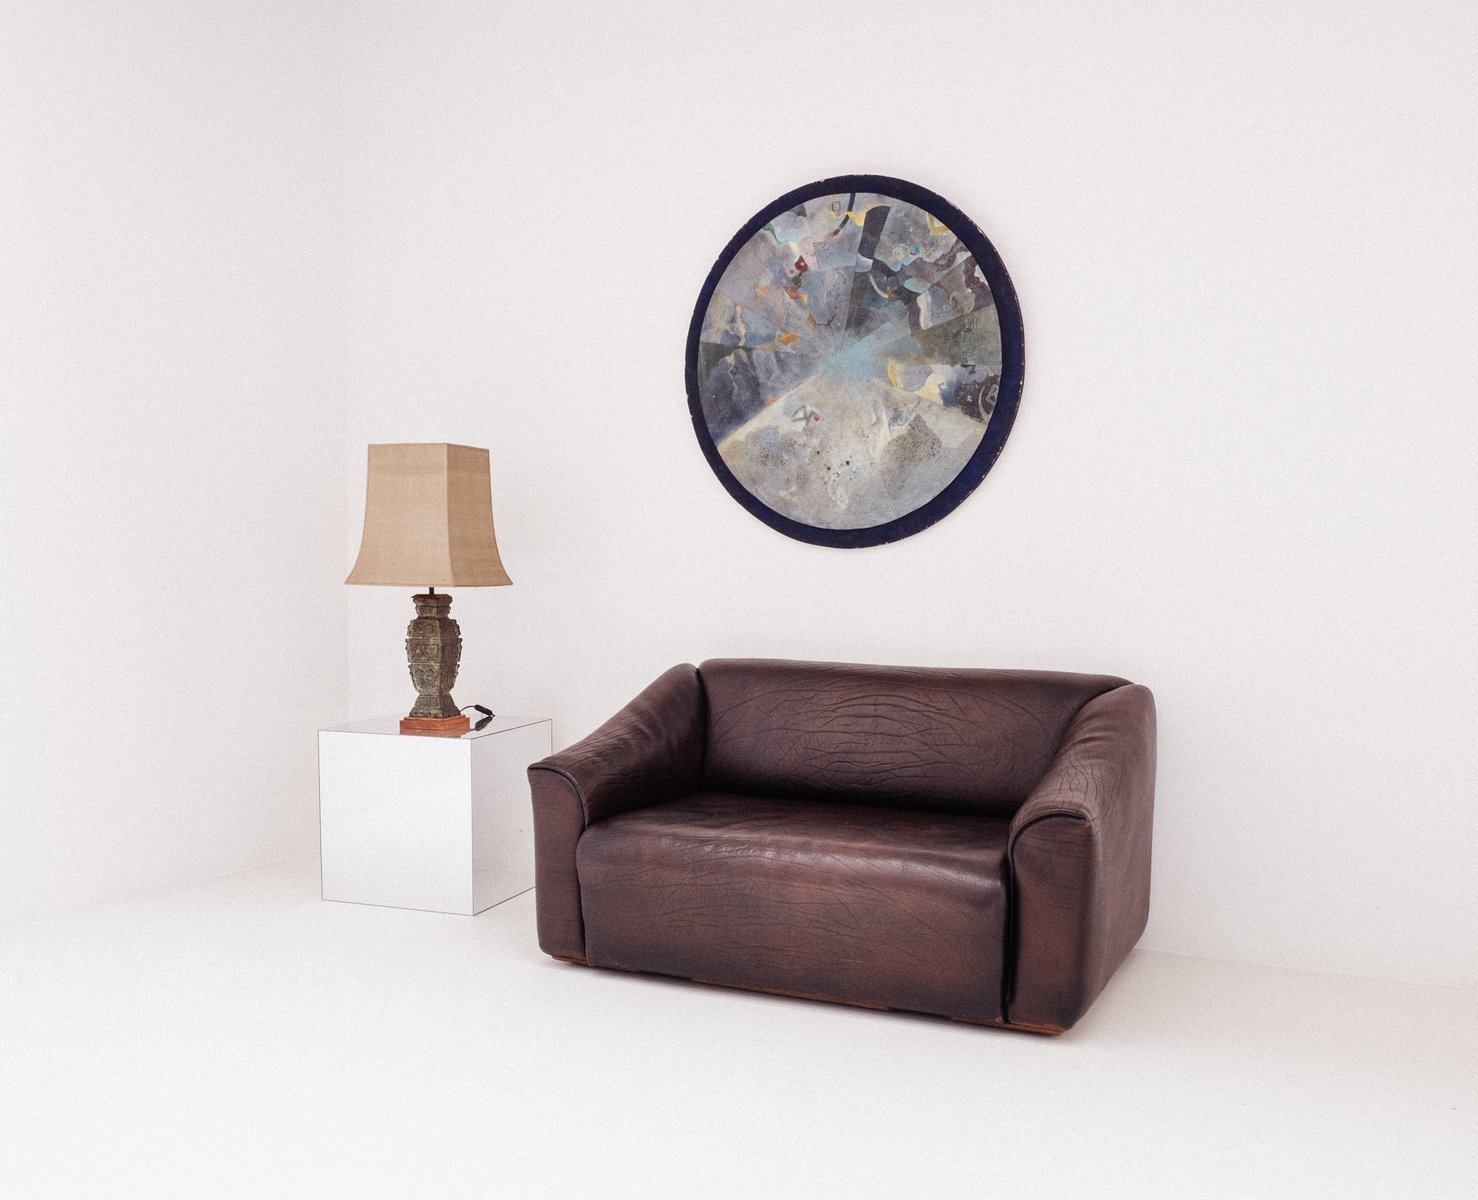 schokoladenbraunes ds 47 2 sitzer sofa von de sede 1970er. Black Bedroom Furniture Sets. Home Design Ideas